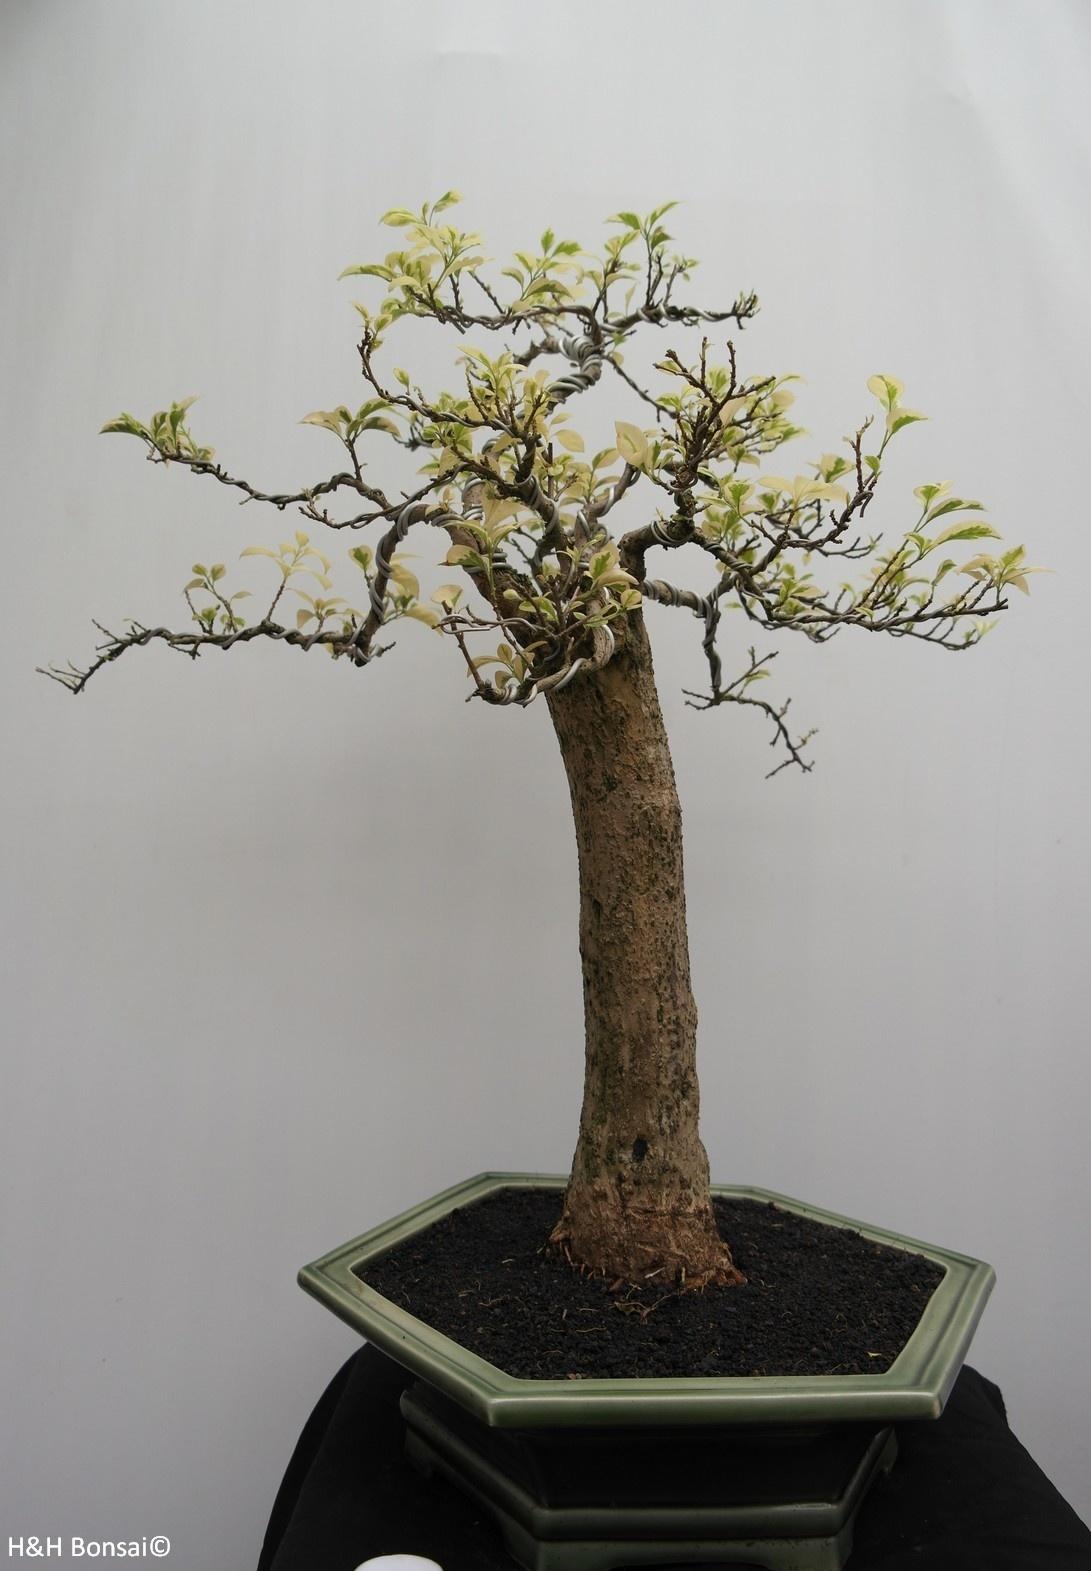 Bonsai Drillingsblume,Bougainvillea glabra, variegata, nr. 7824